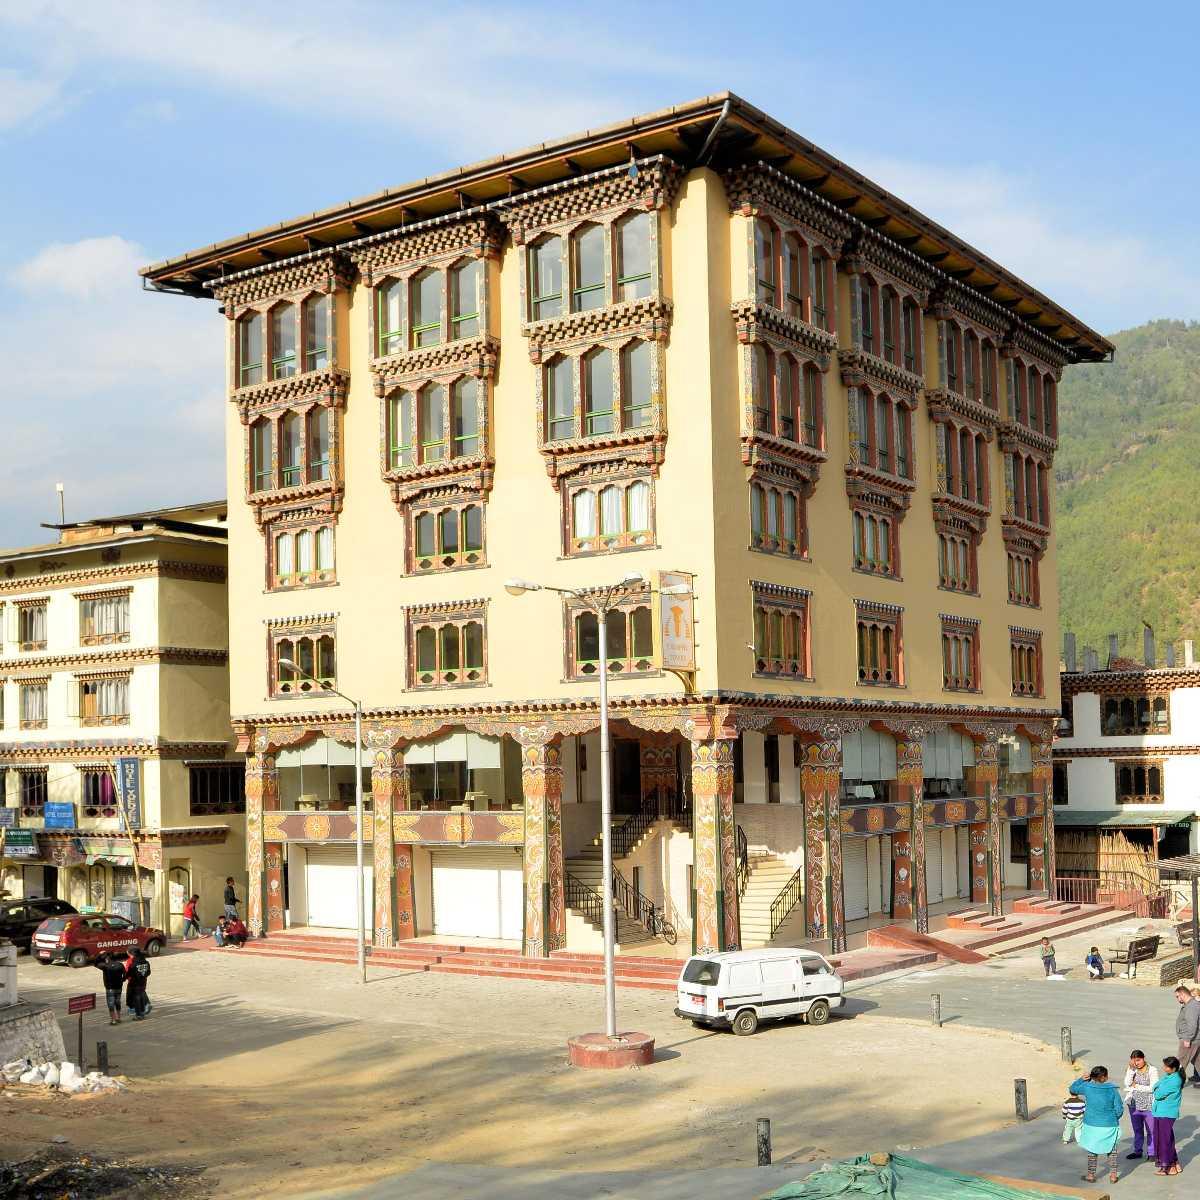 Luxury Hotels in Bhutan, Hotel Thimphu Towers